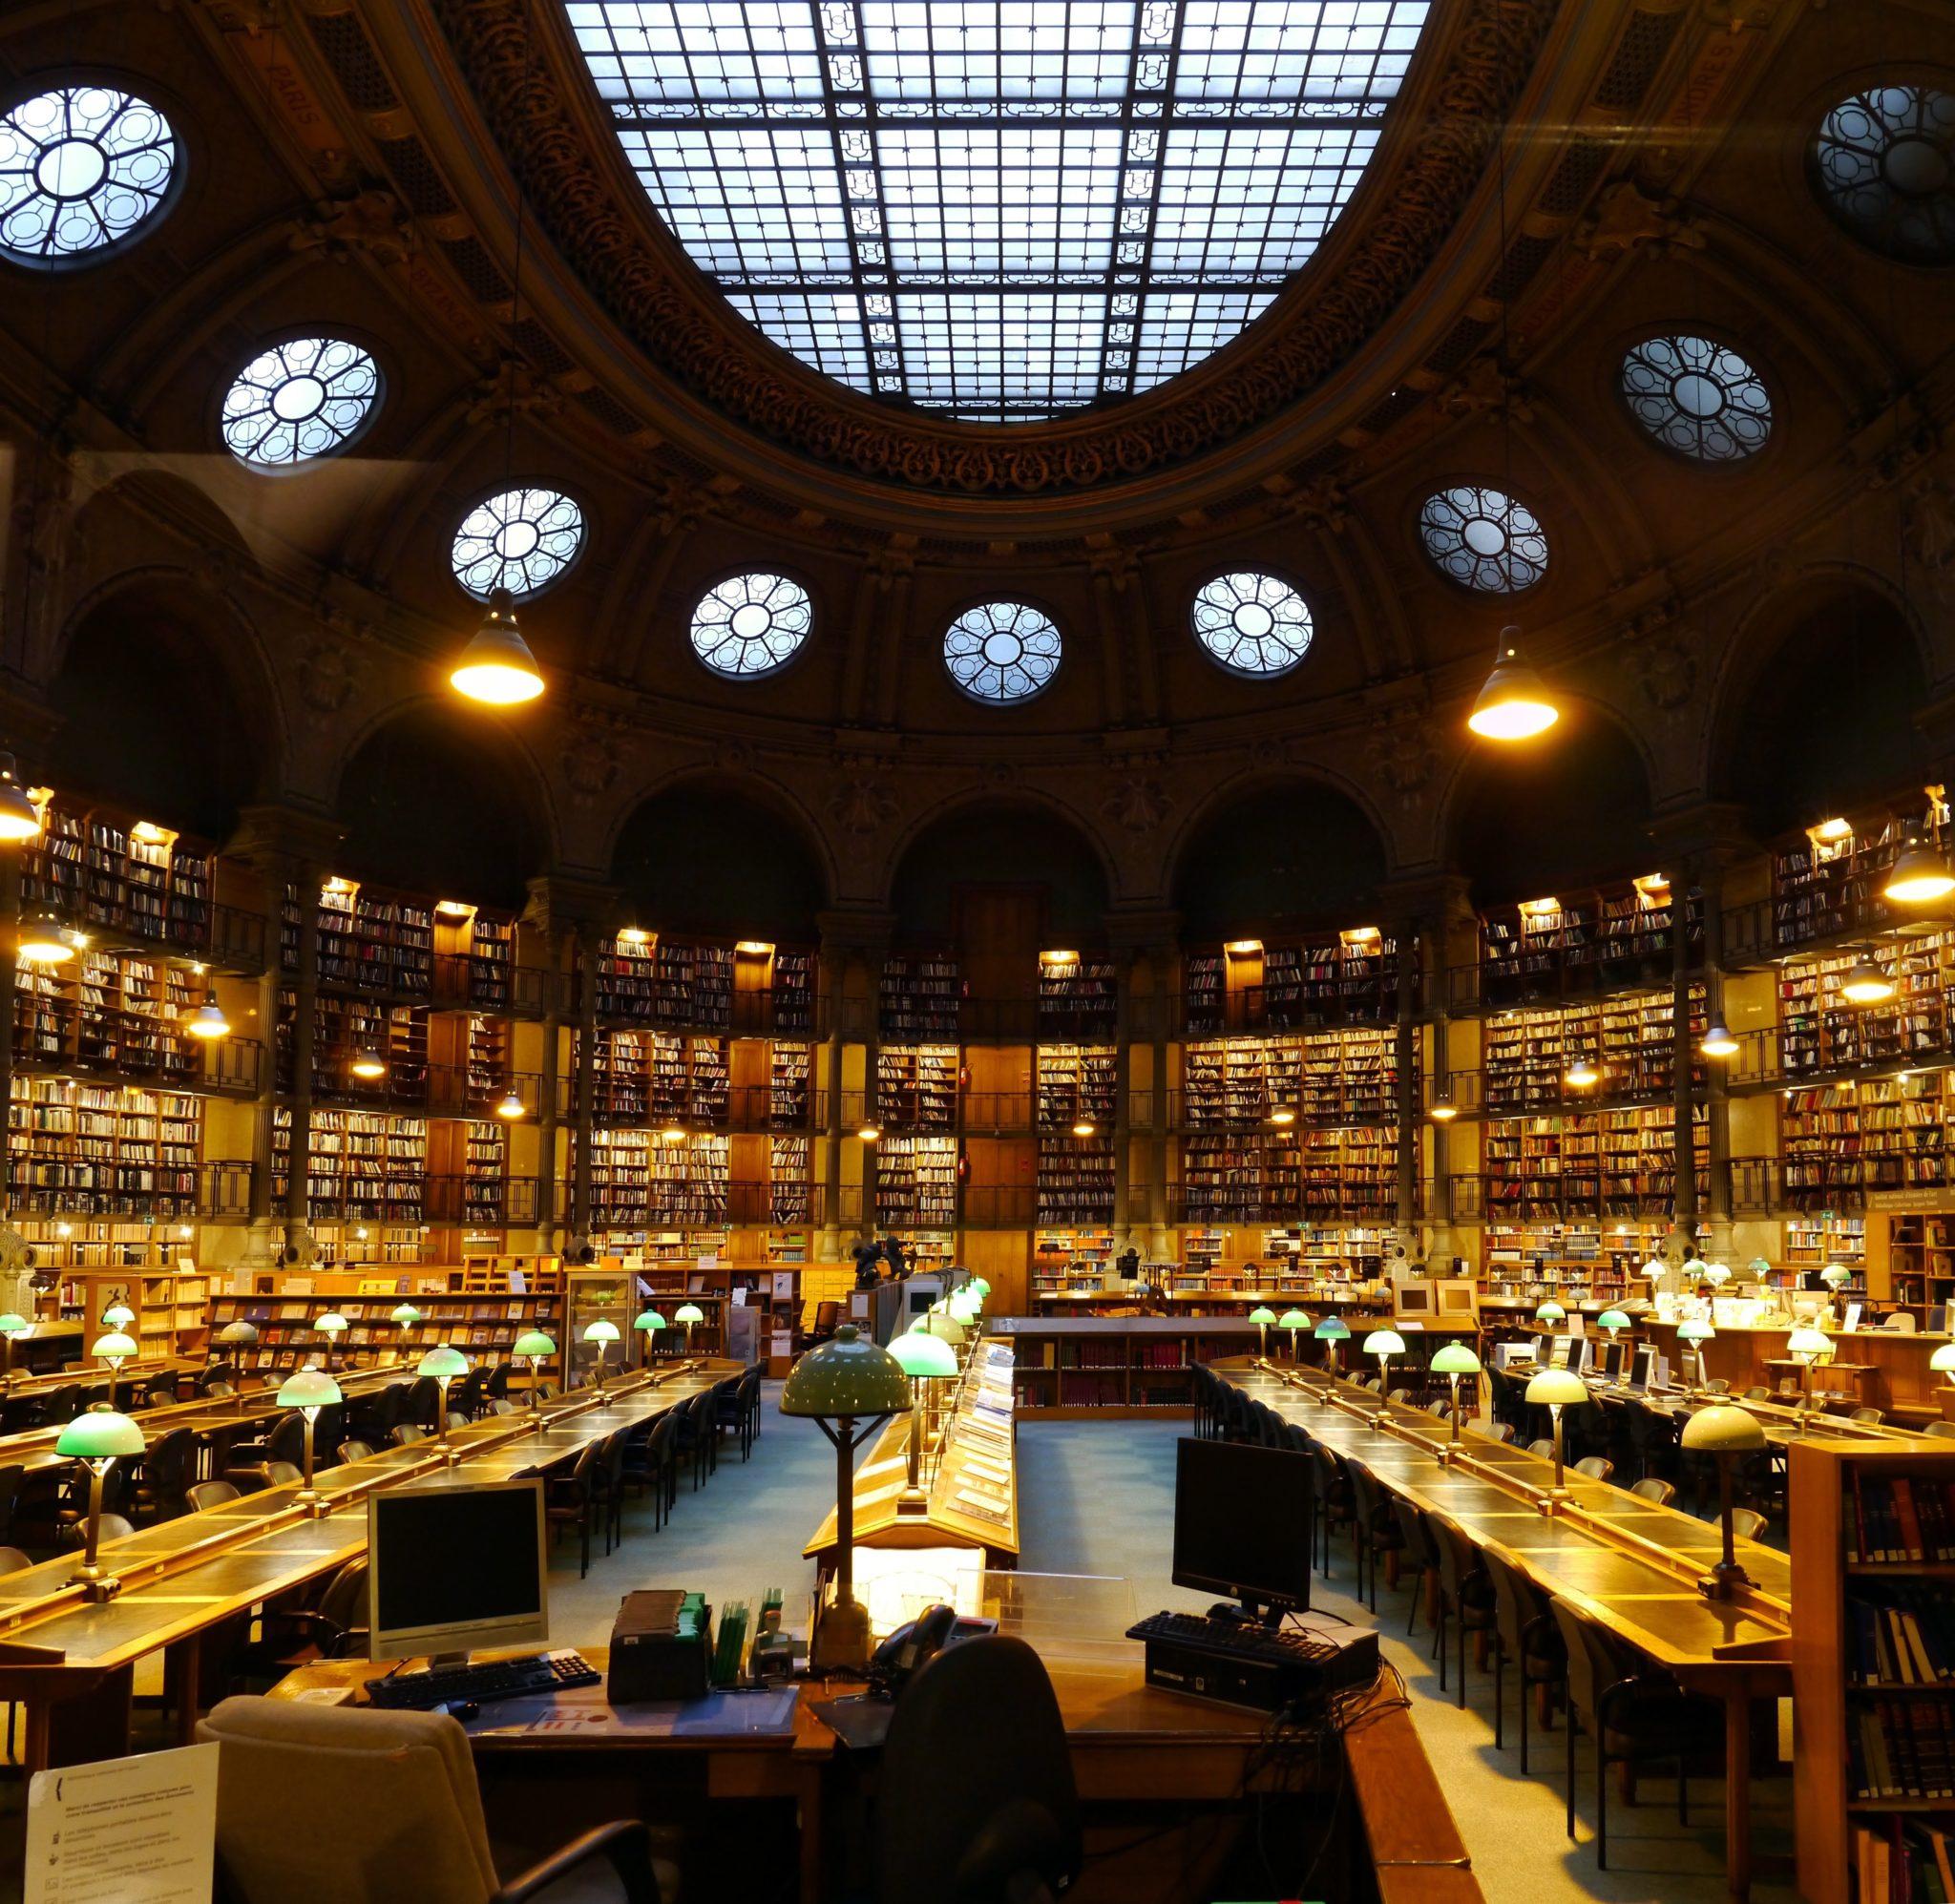 https://upload.wikimedia.org/wikipedia/commons/3/3f/Biblioth%C3%A8que_nationale_de_France_%28site_Richelieu%29%2C_Paris_-_Salle_Ovale.jpg